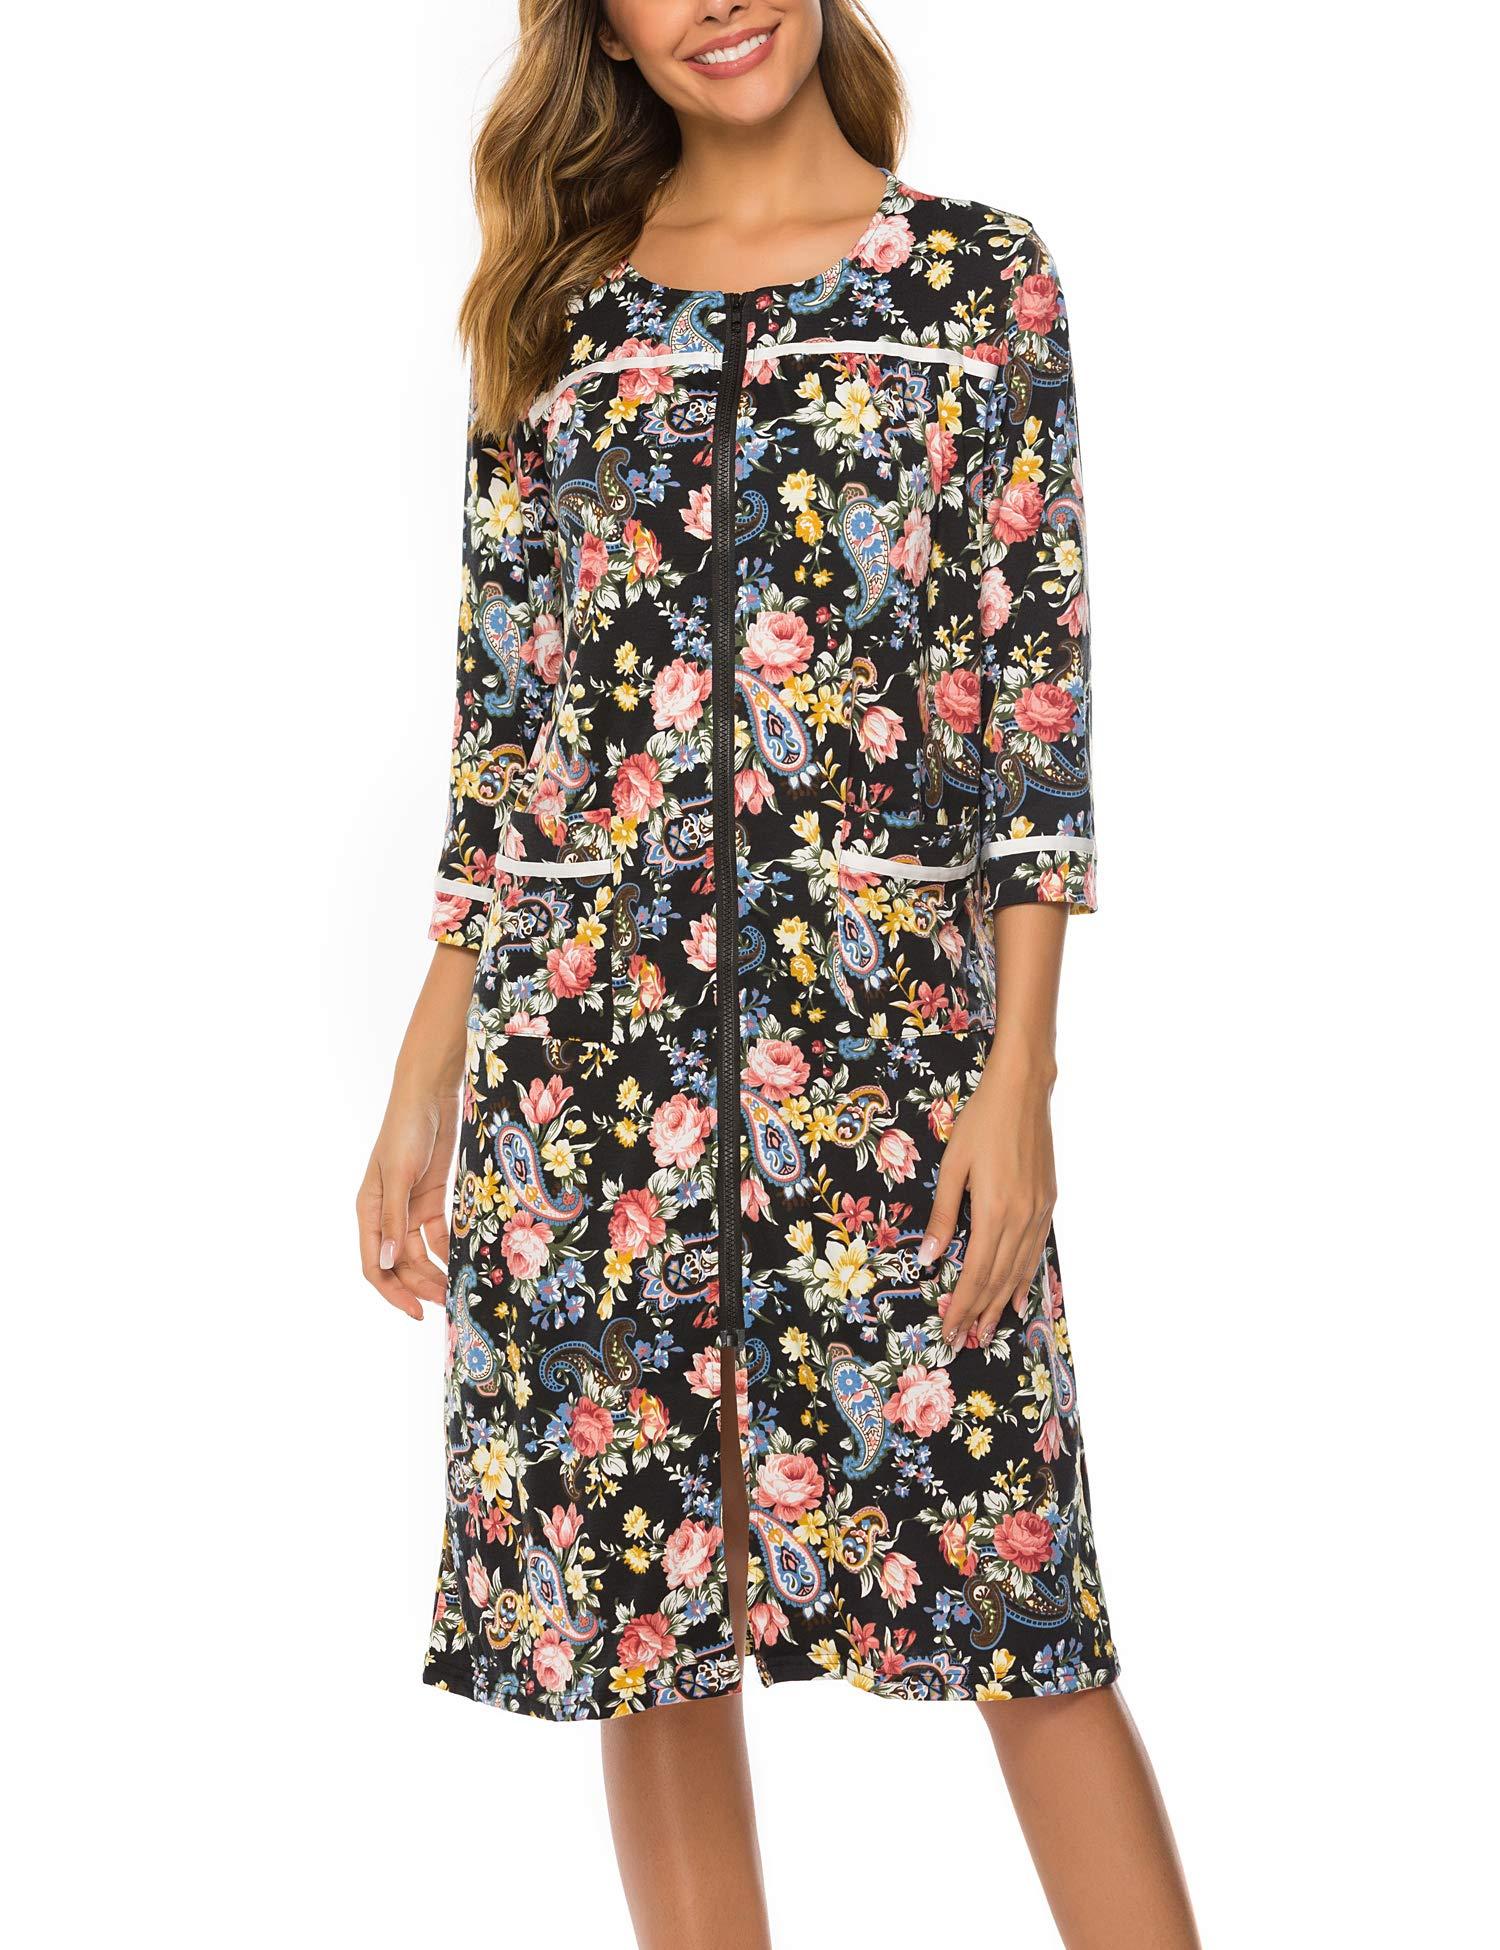 UUANG Women Zipper Robe Half Sleeve Loungewear Knee Length Nightgown Duster Housecoat with Pockets S-XXL